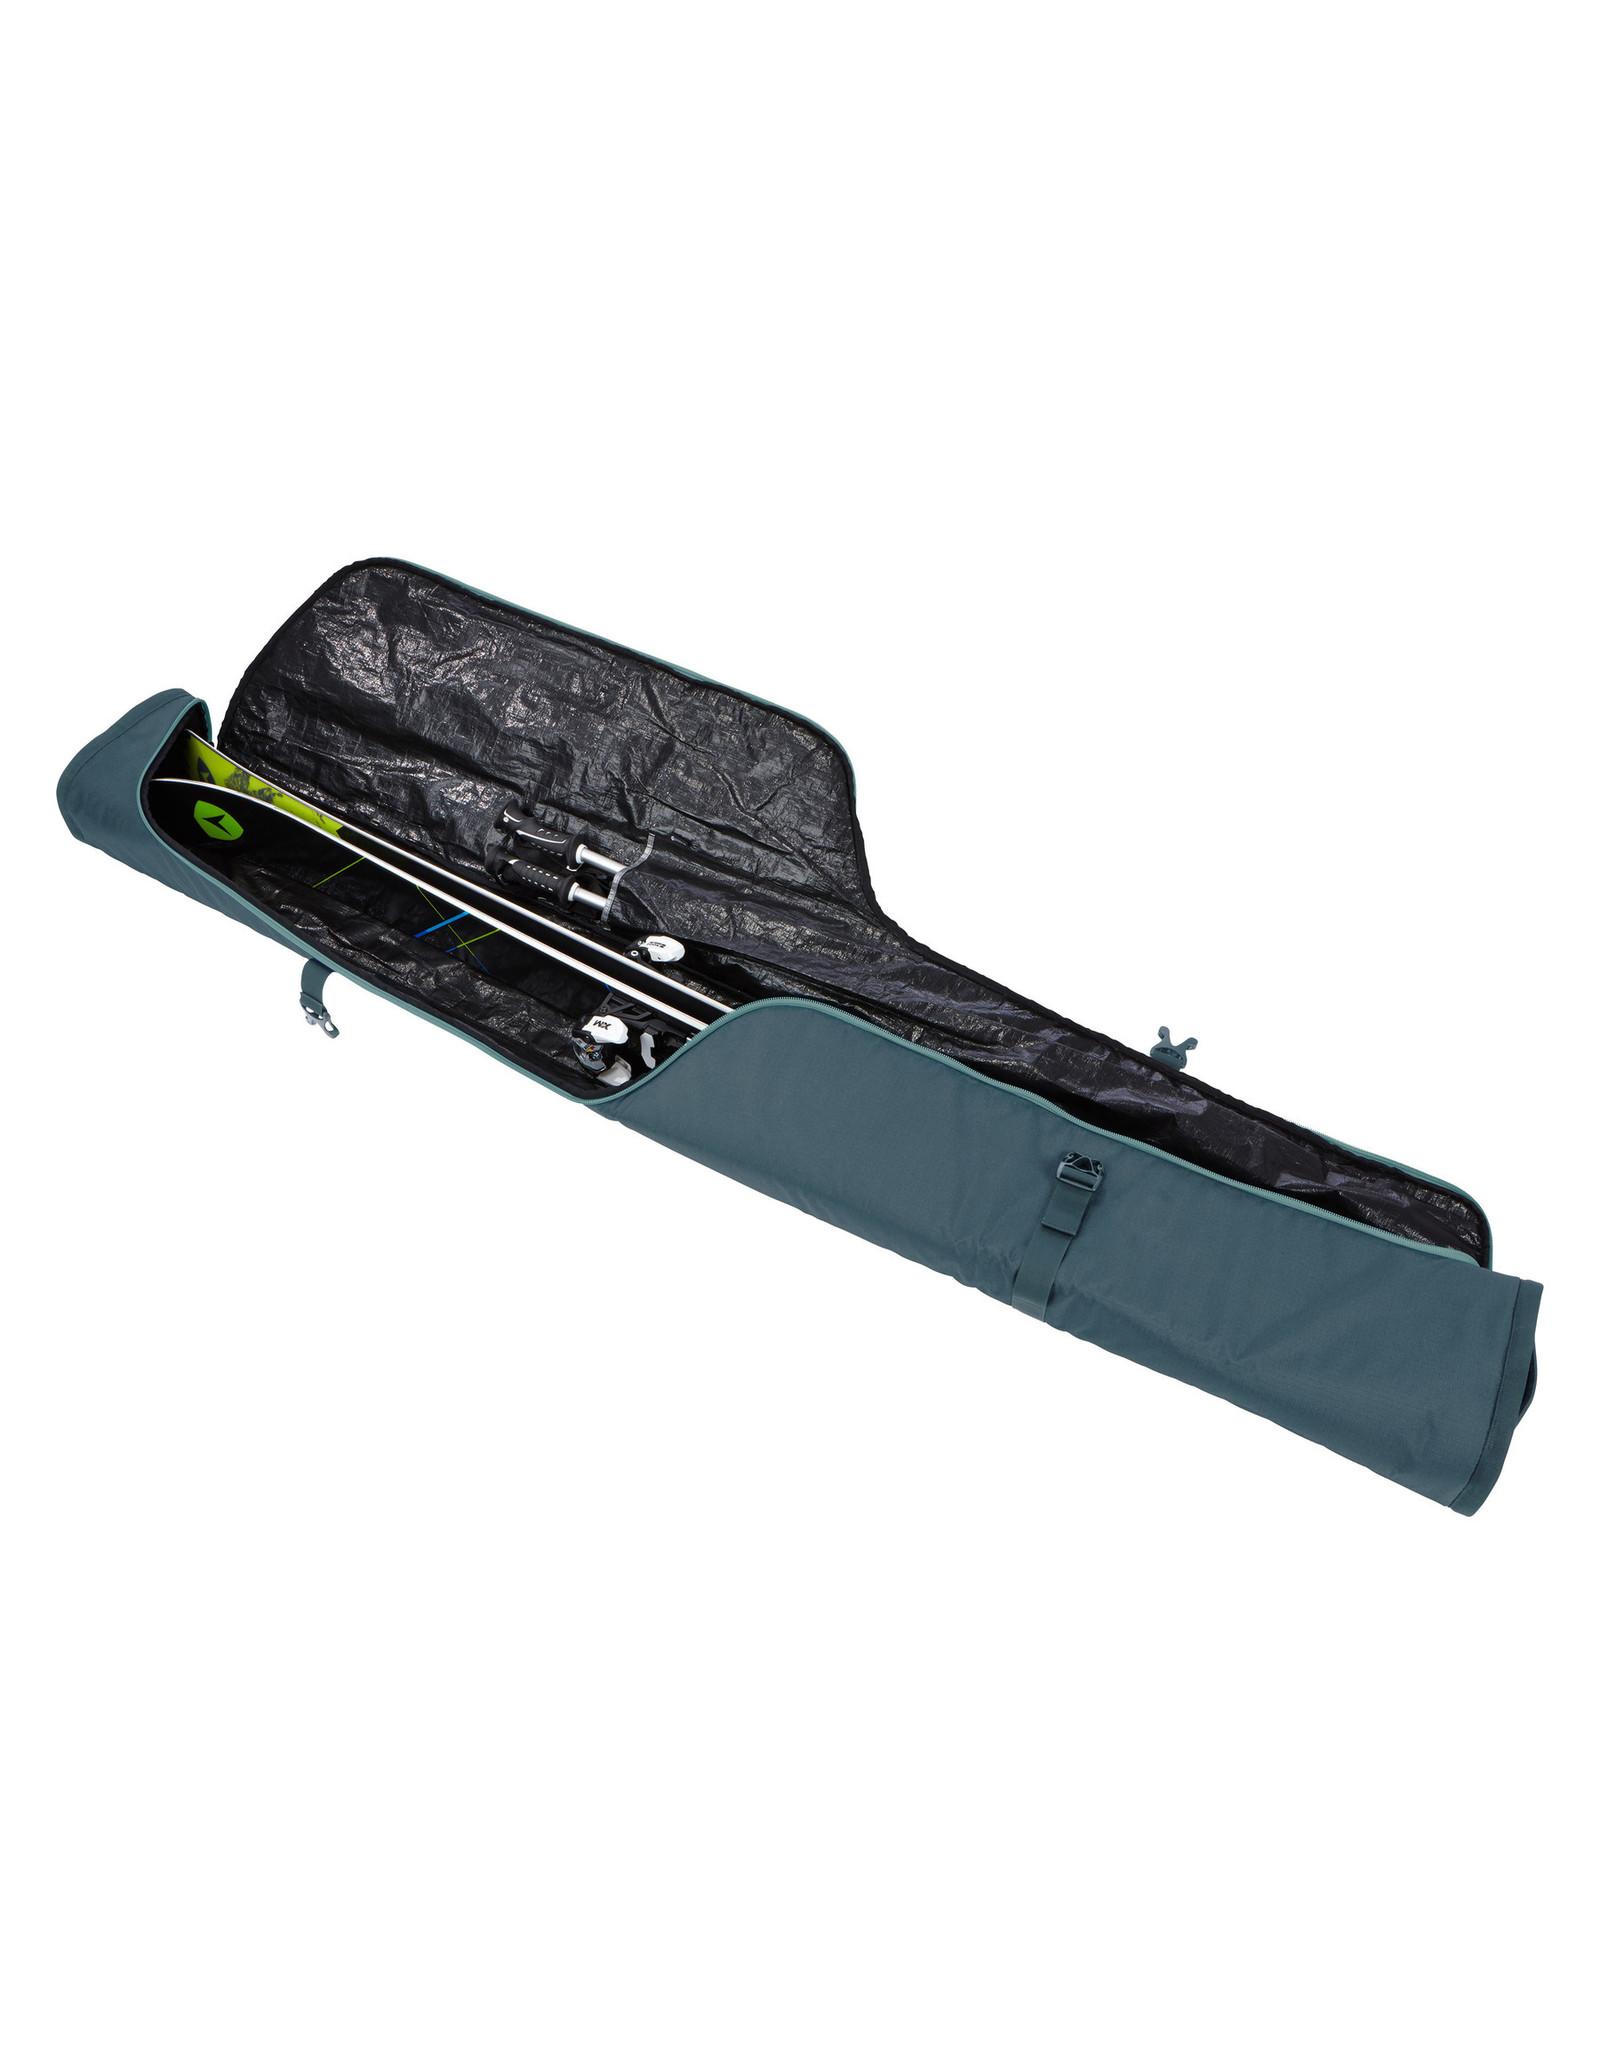 Thule Thule Roundtrip Ski Bag 195cm